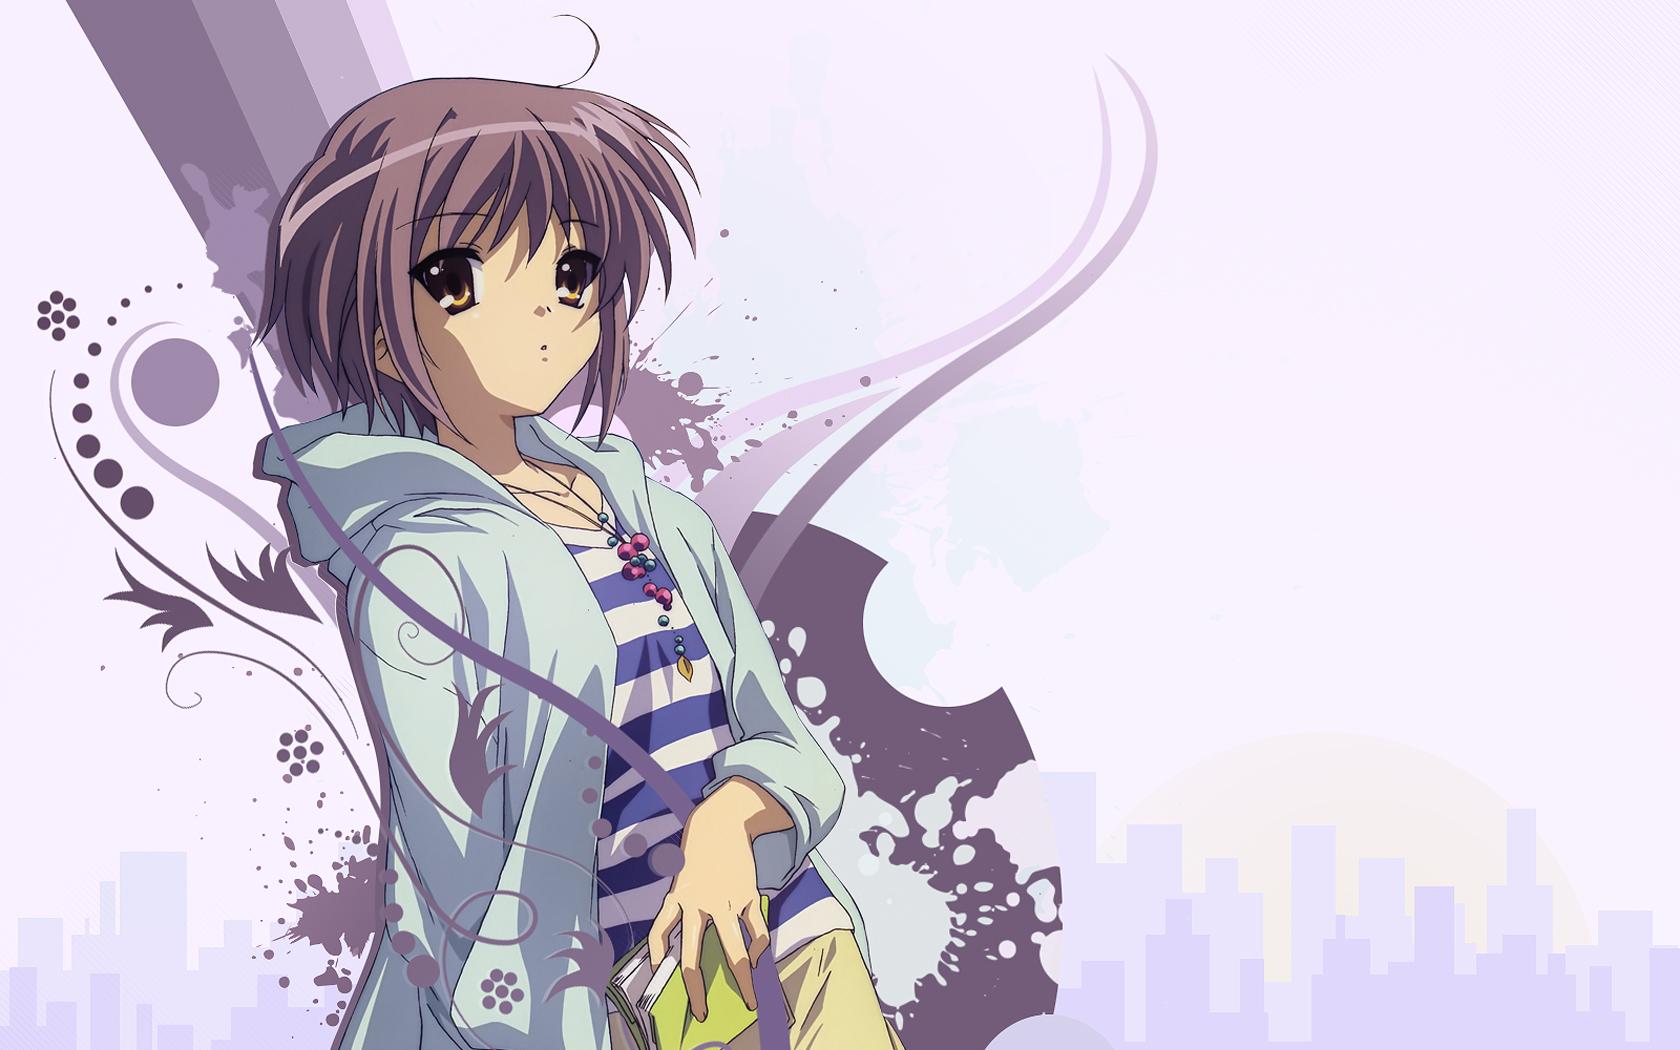 Anime - The Melancholy Of Haruhi Suzumiya Yuki Nagato Anime Sakura ...